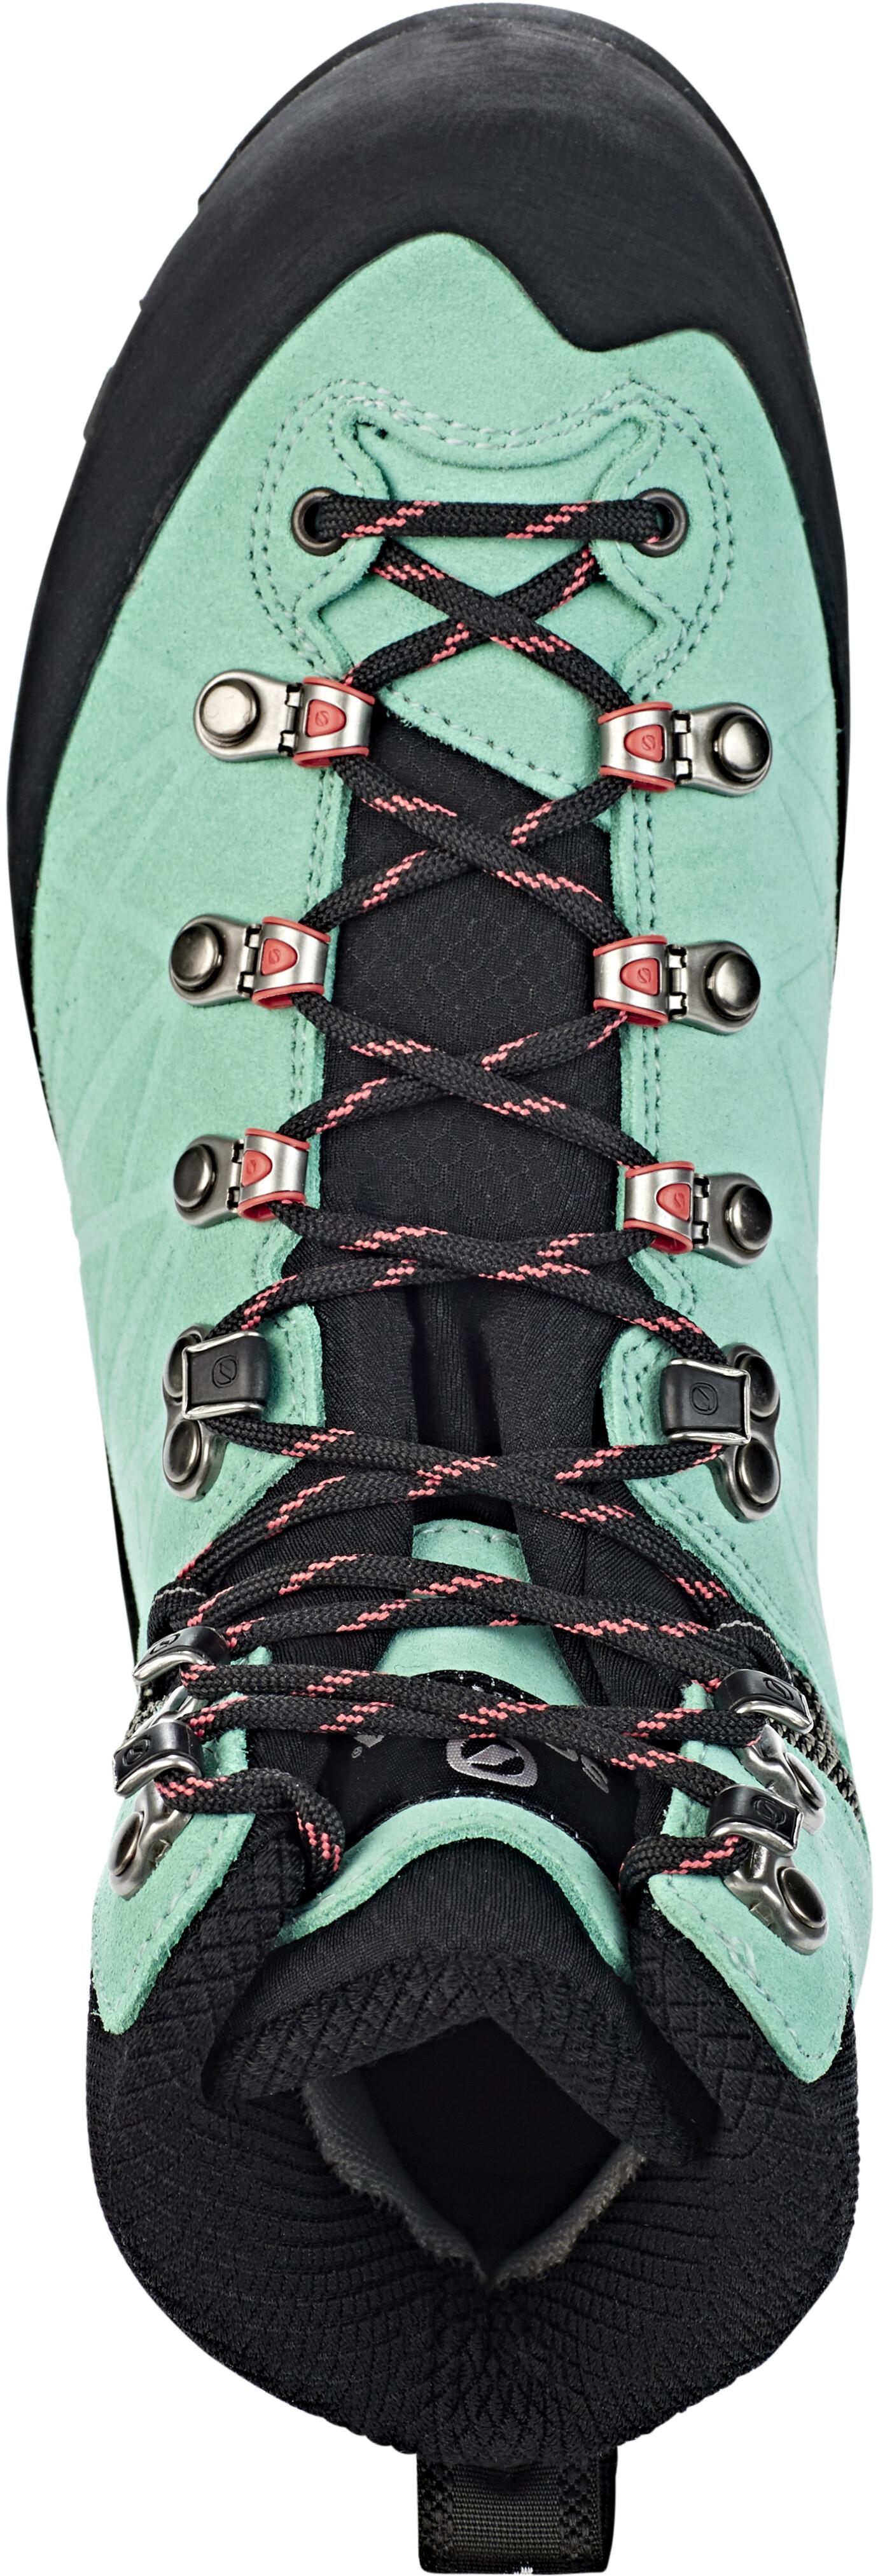 Scarpa Marmolada Pro OD Scarpe Donna nero turchese su Addnature 048bbae1b11